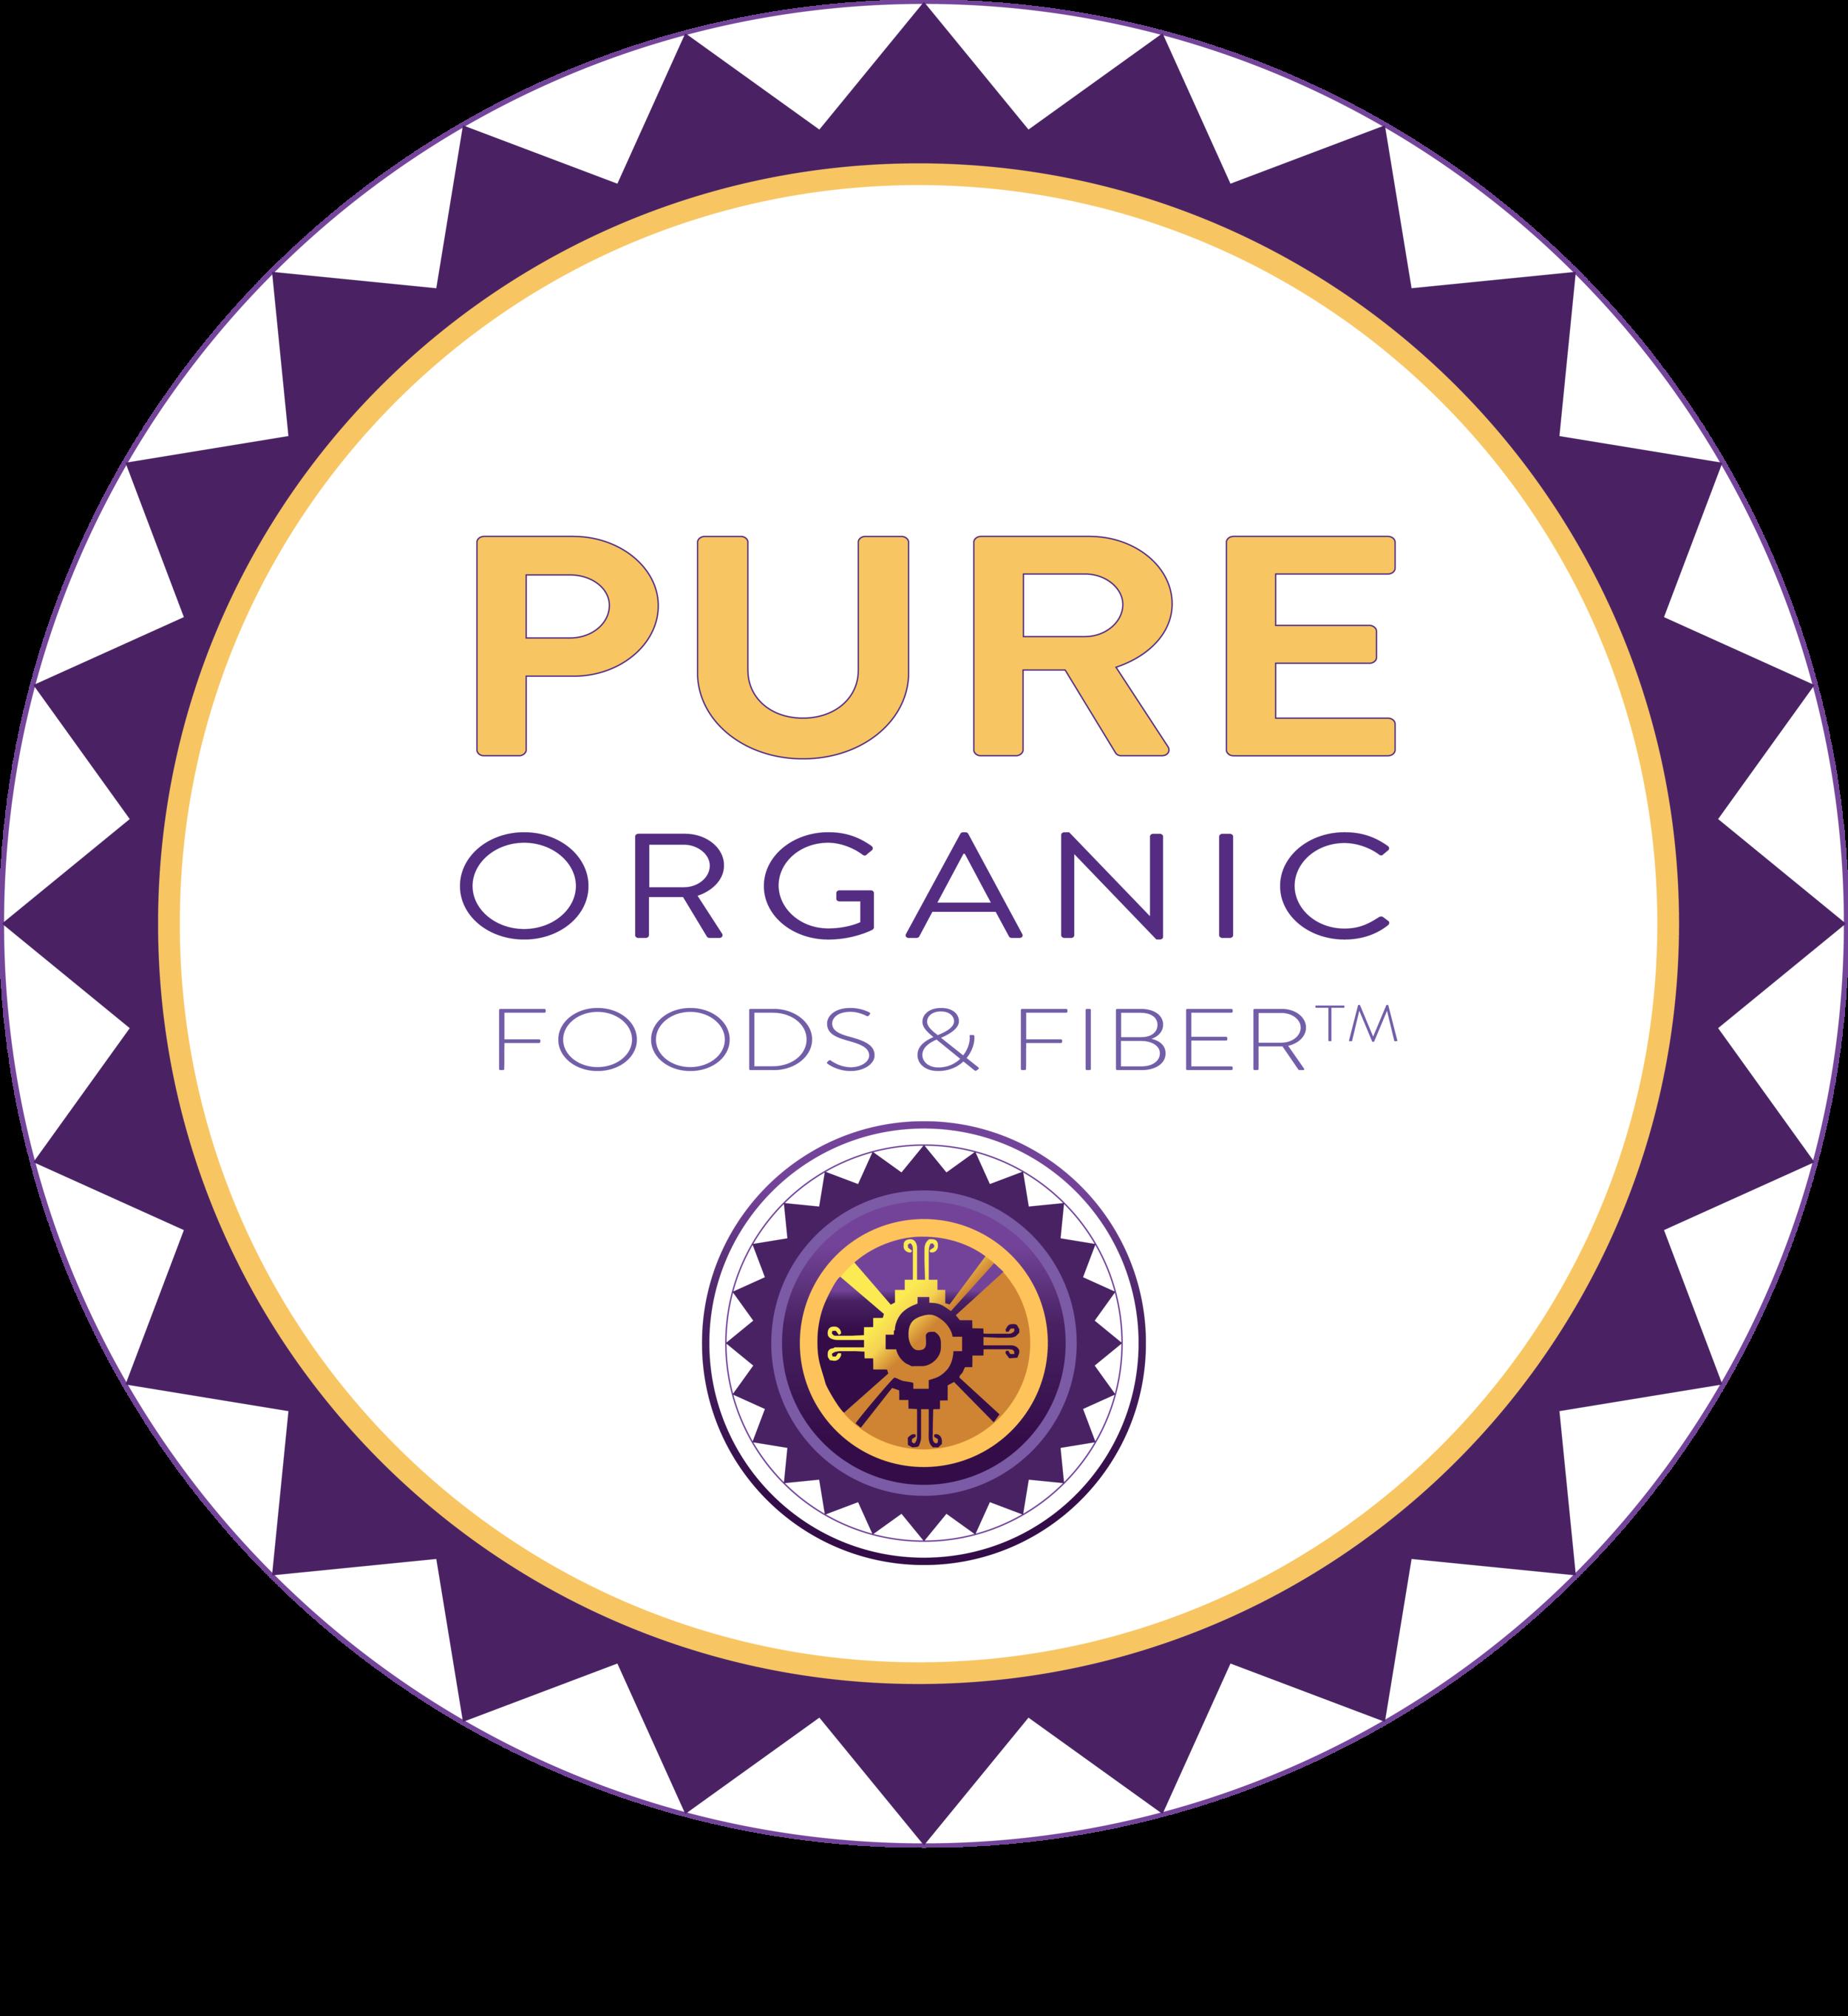 Pure Organic Foods & Fiber